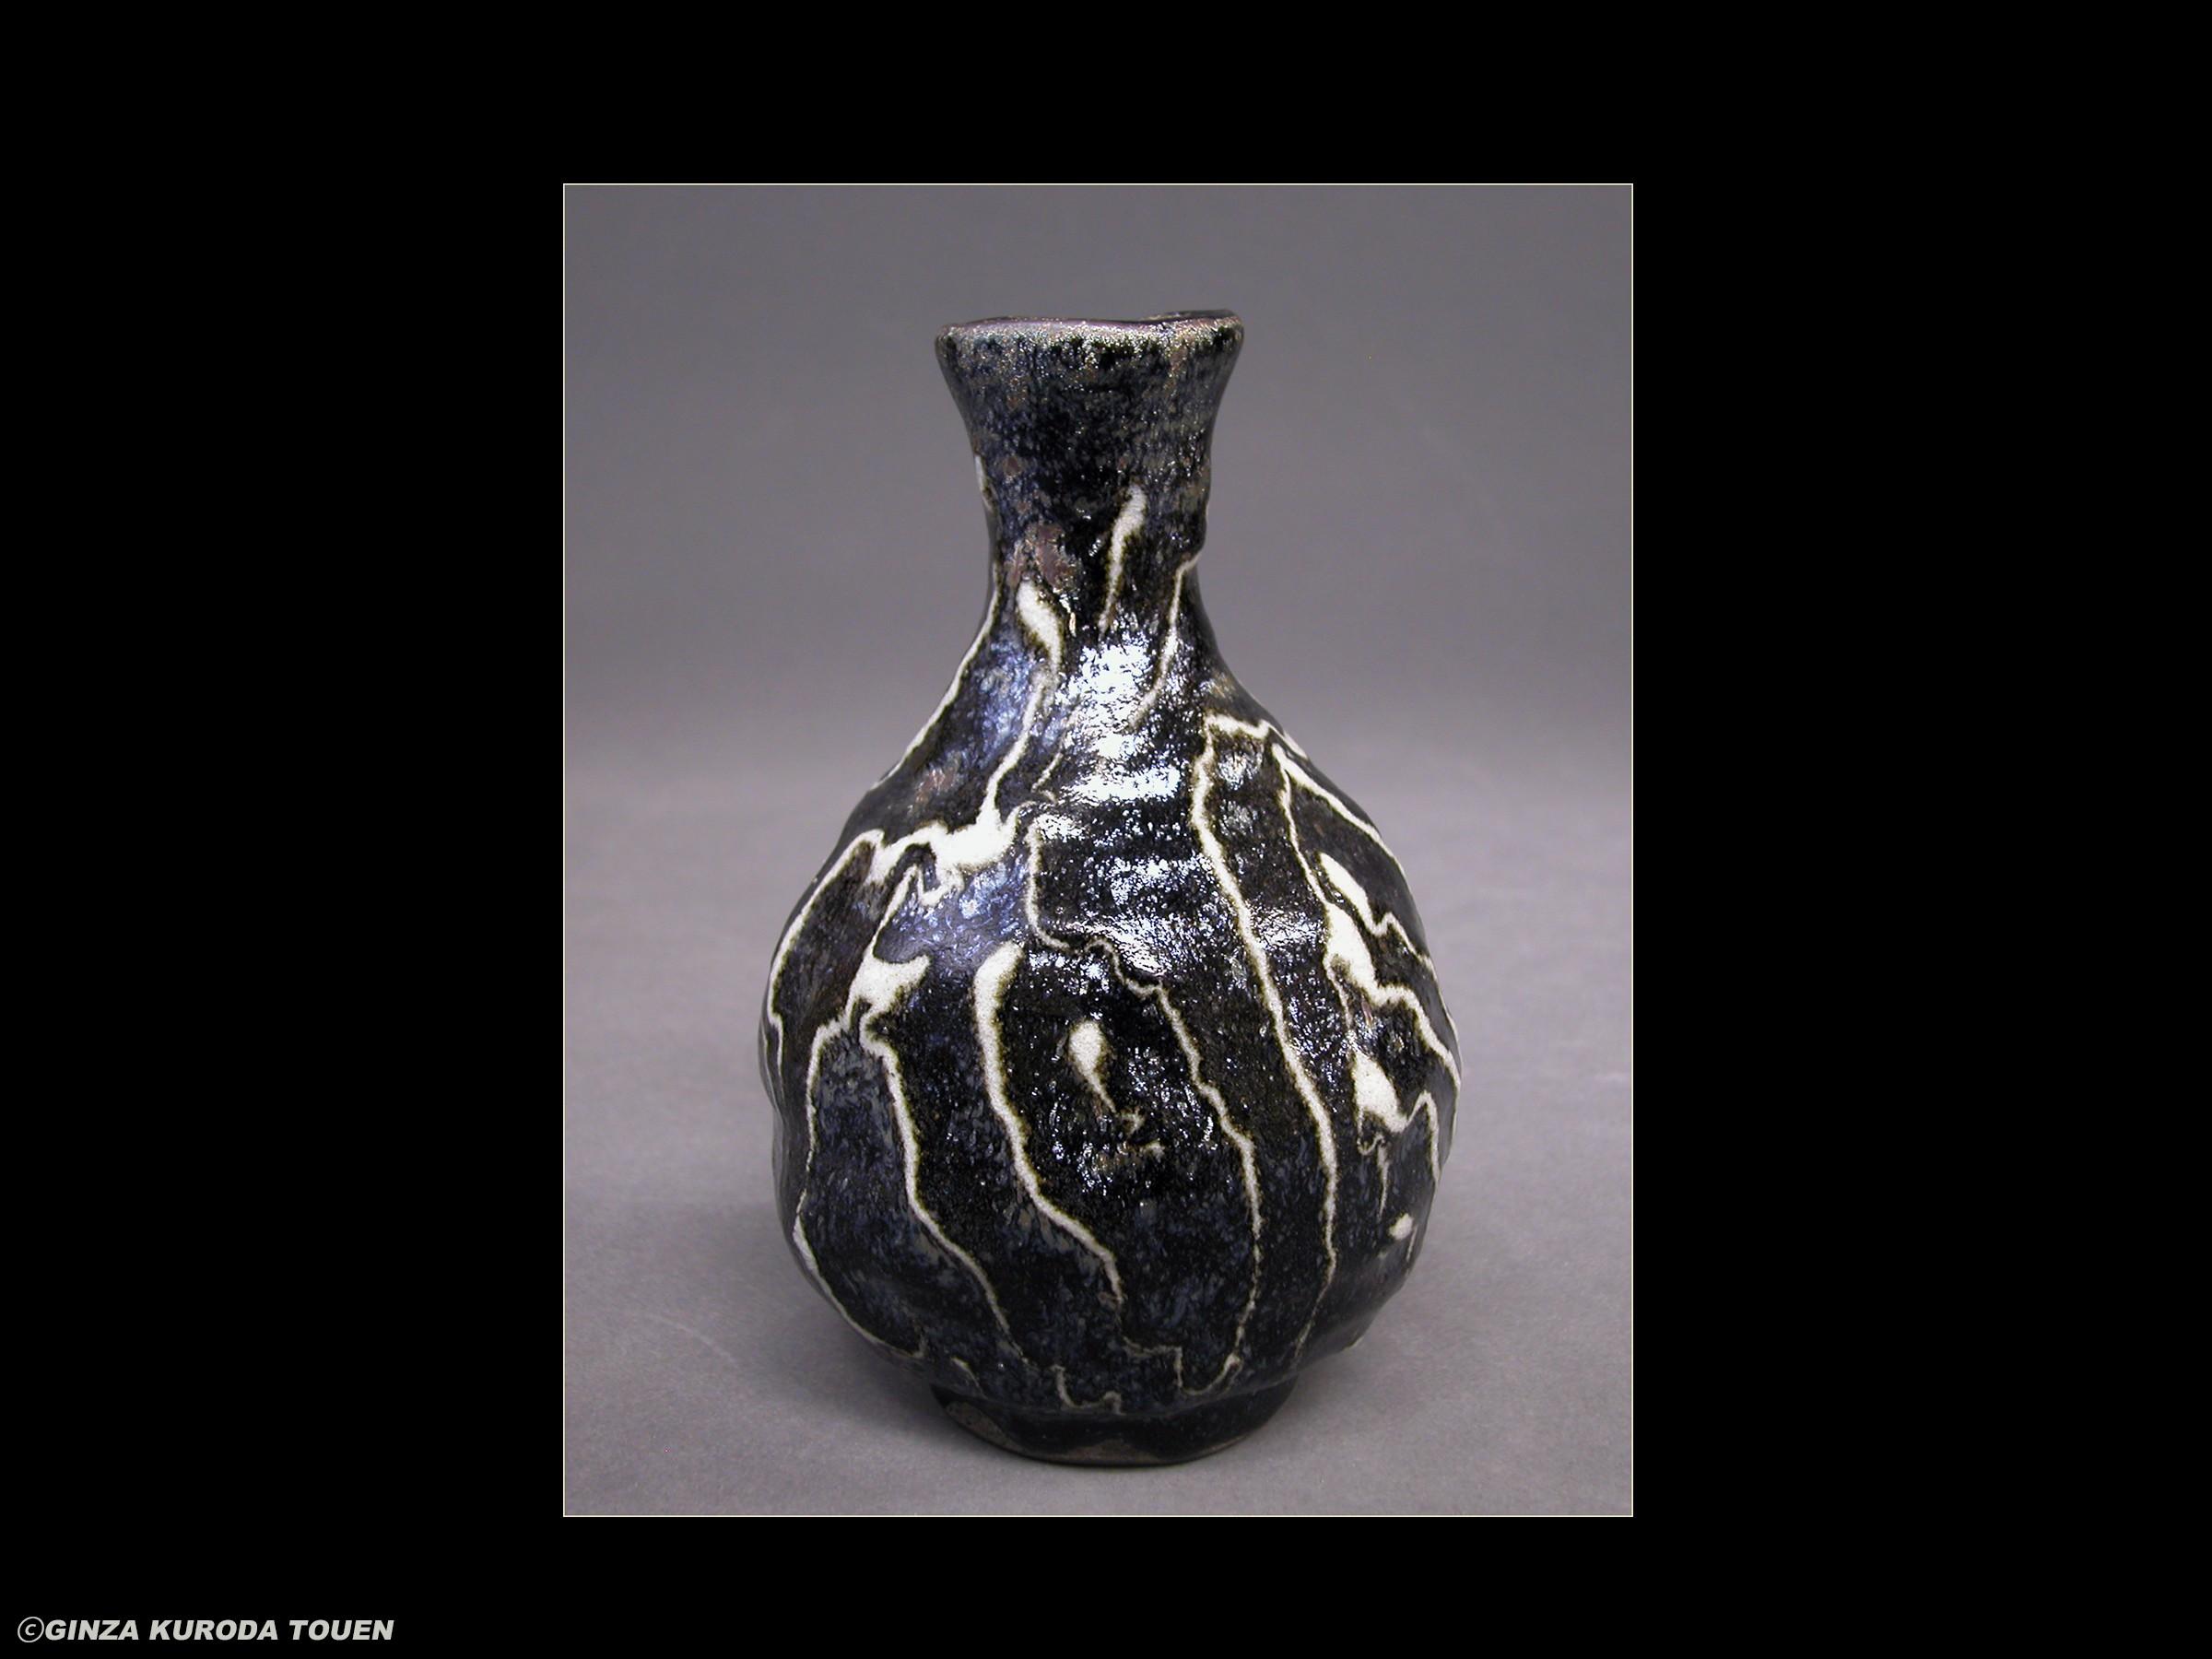 Uichi Shimizu: Sake bottle